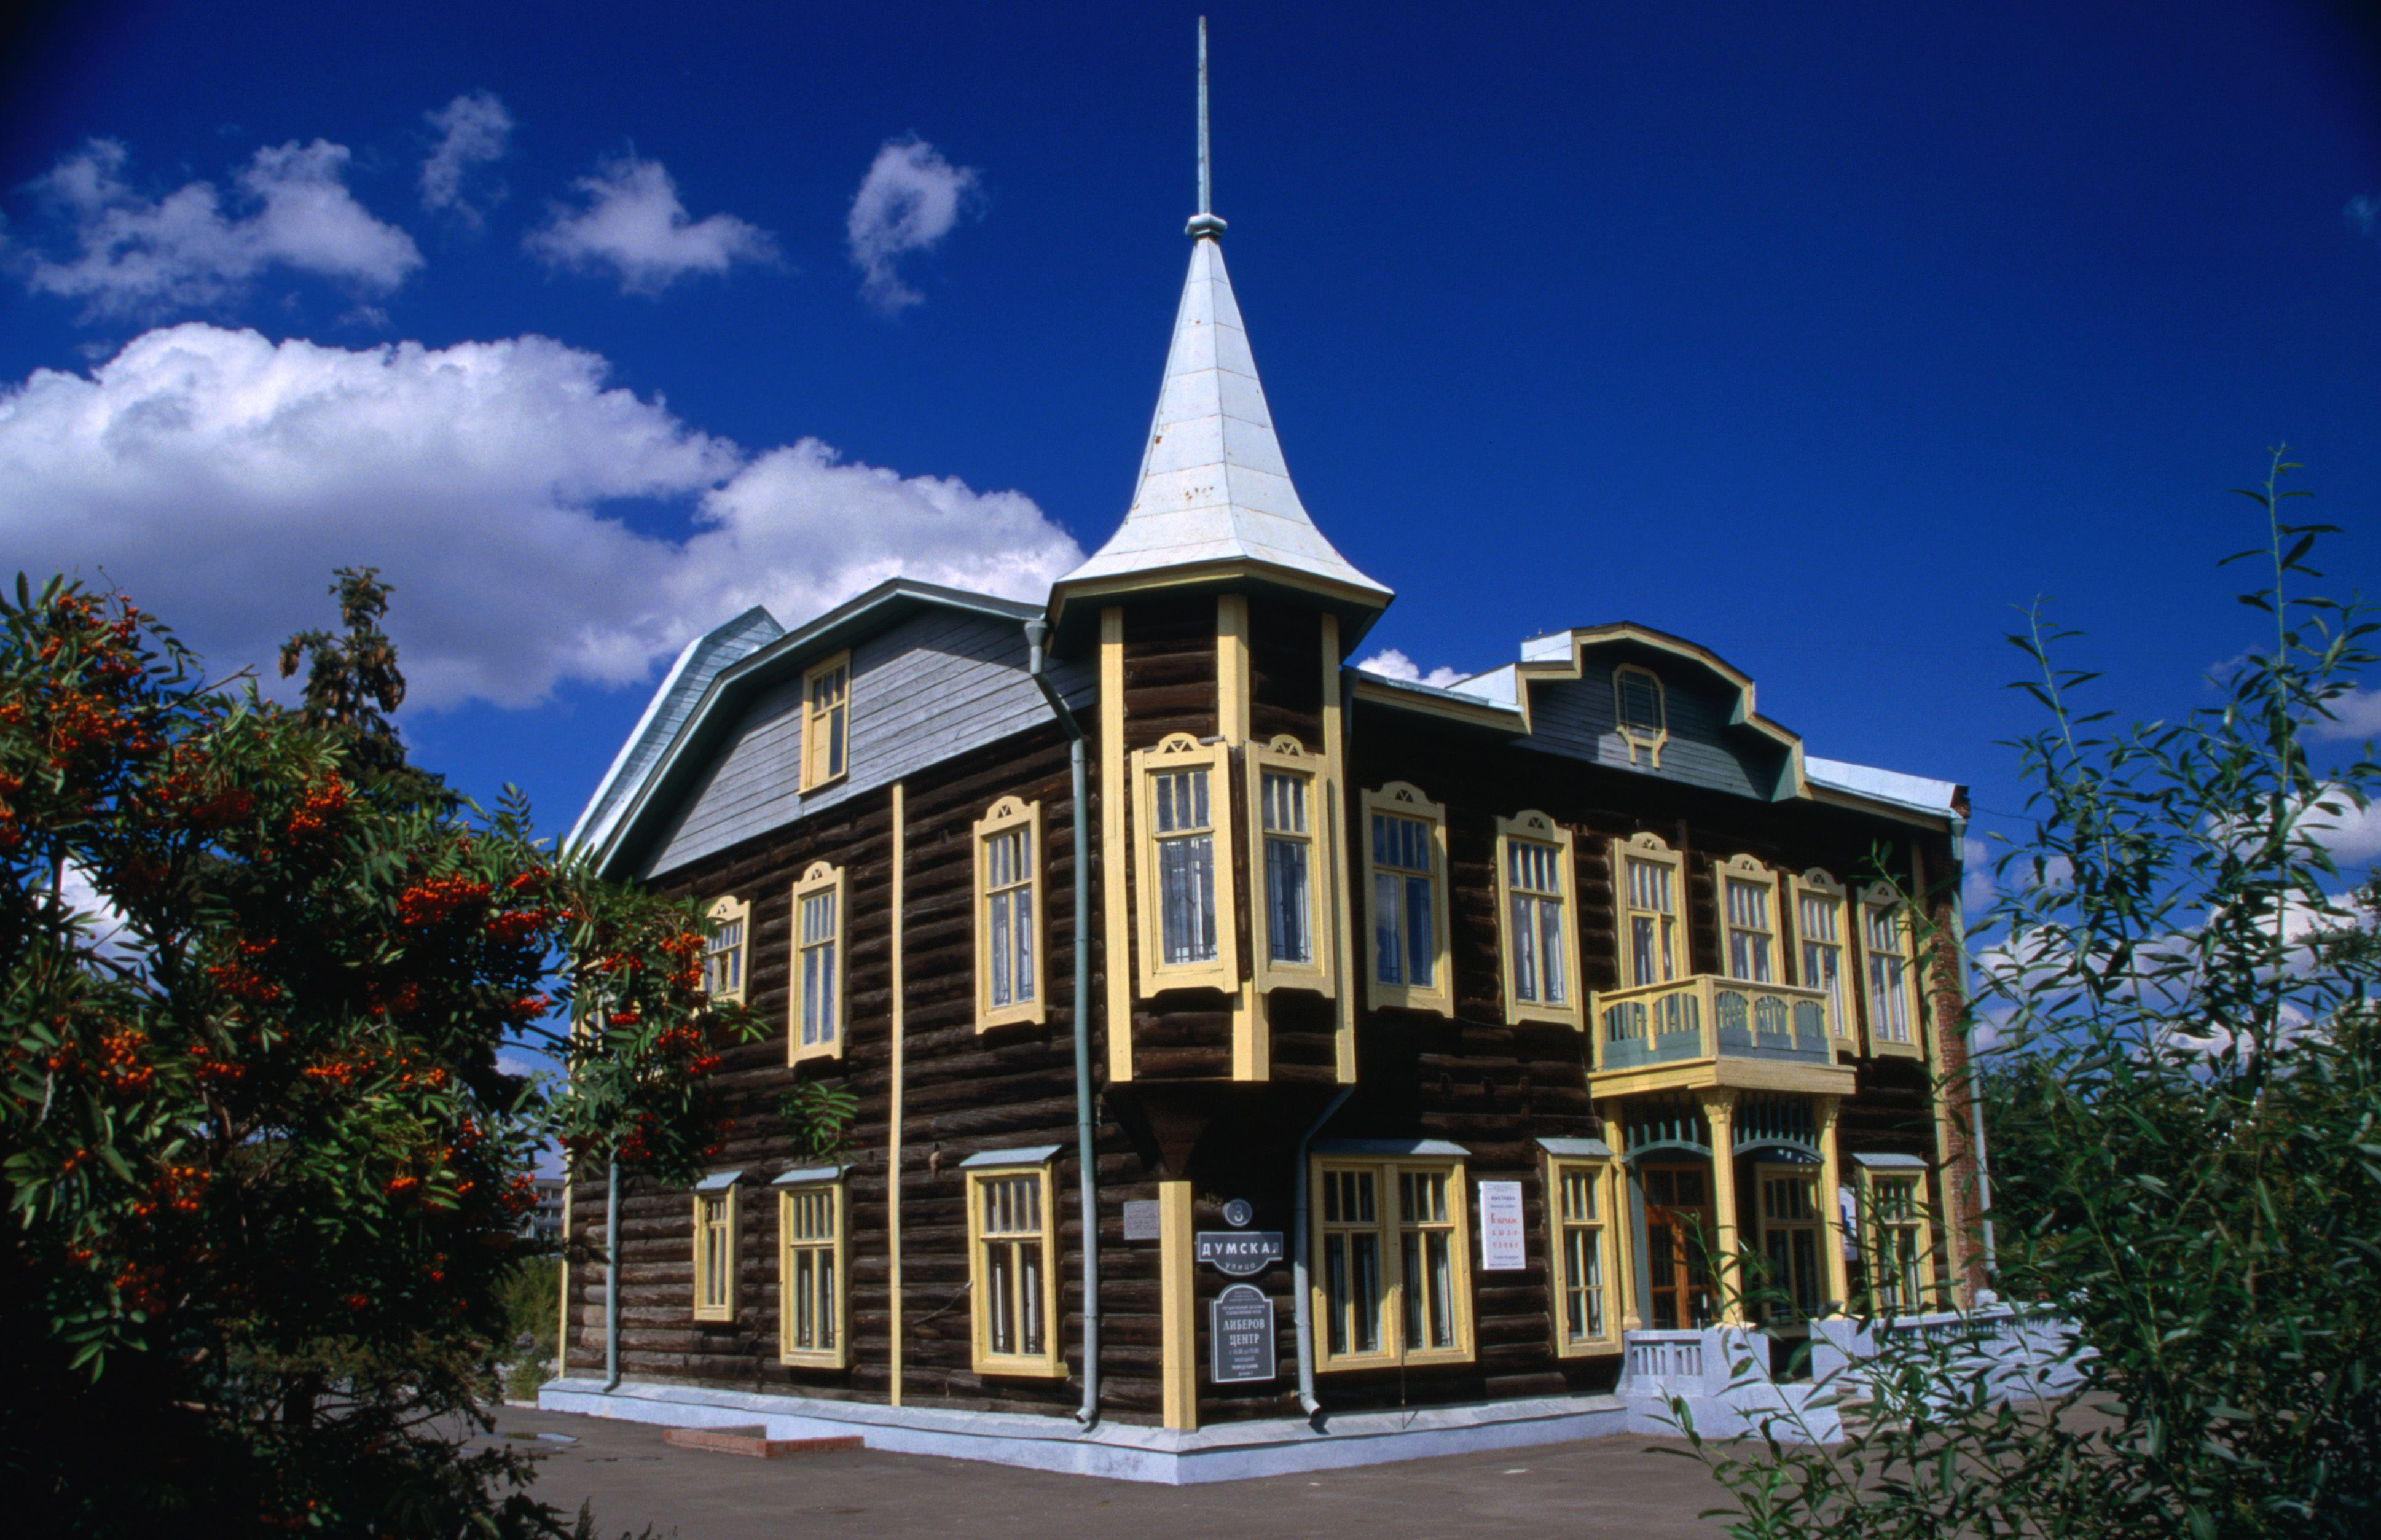 Liberov center Omsk state art museum